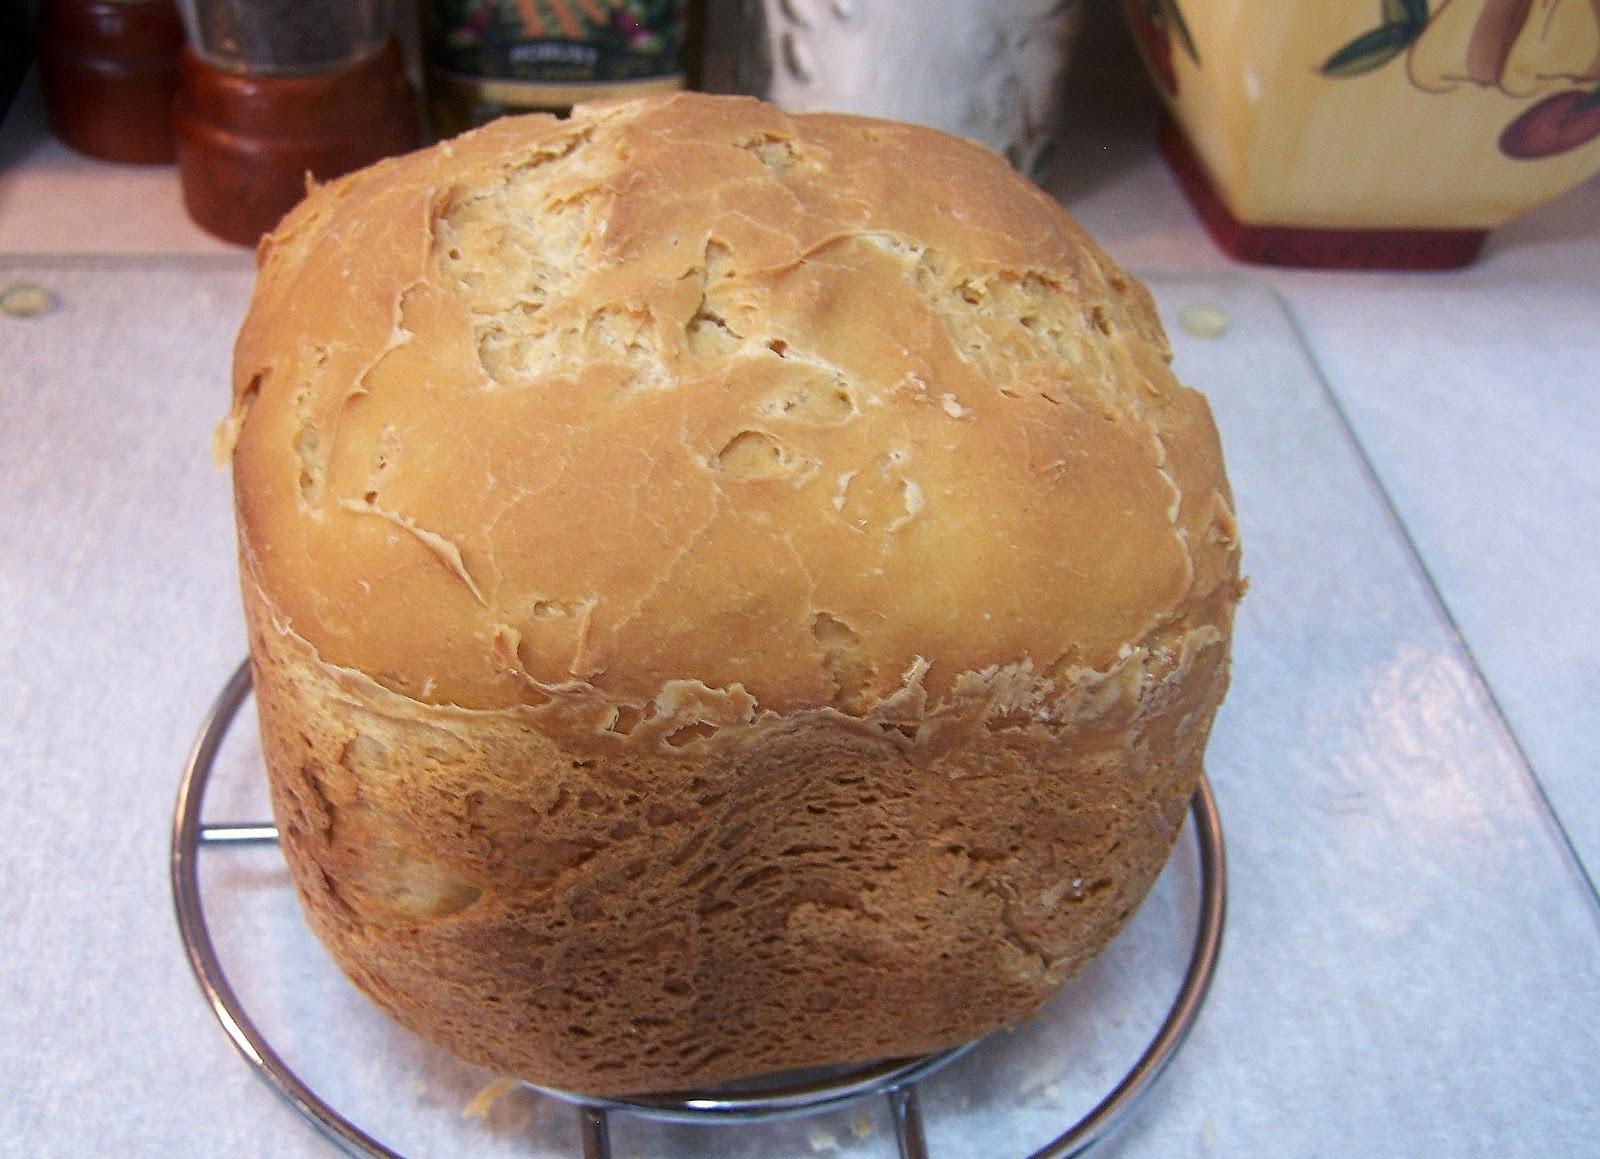 Gluten Free Bread Machine Recipes  Spectacular Gluten Free Bread in the Bread Machine